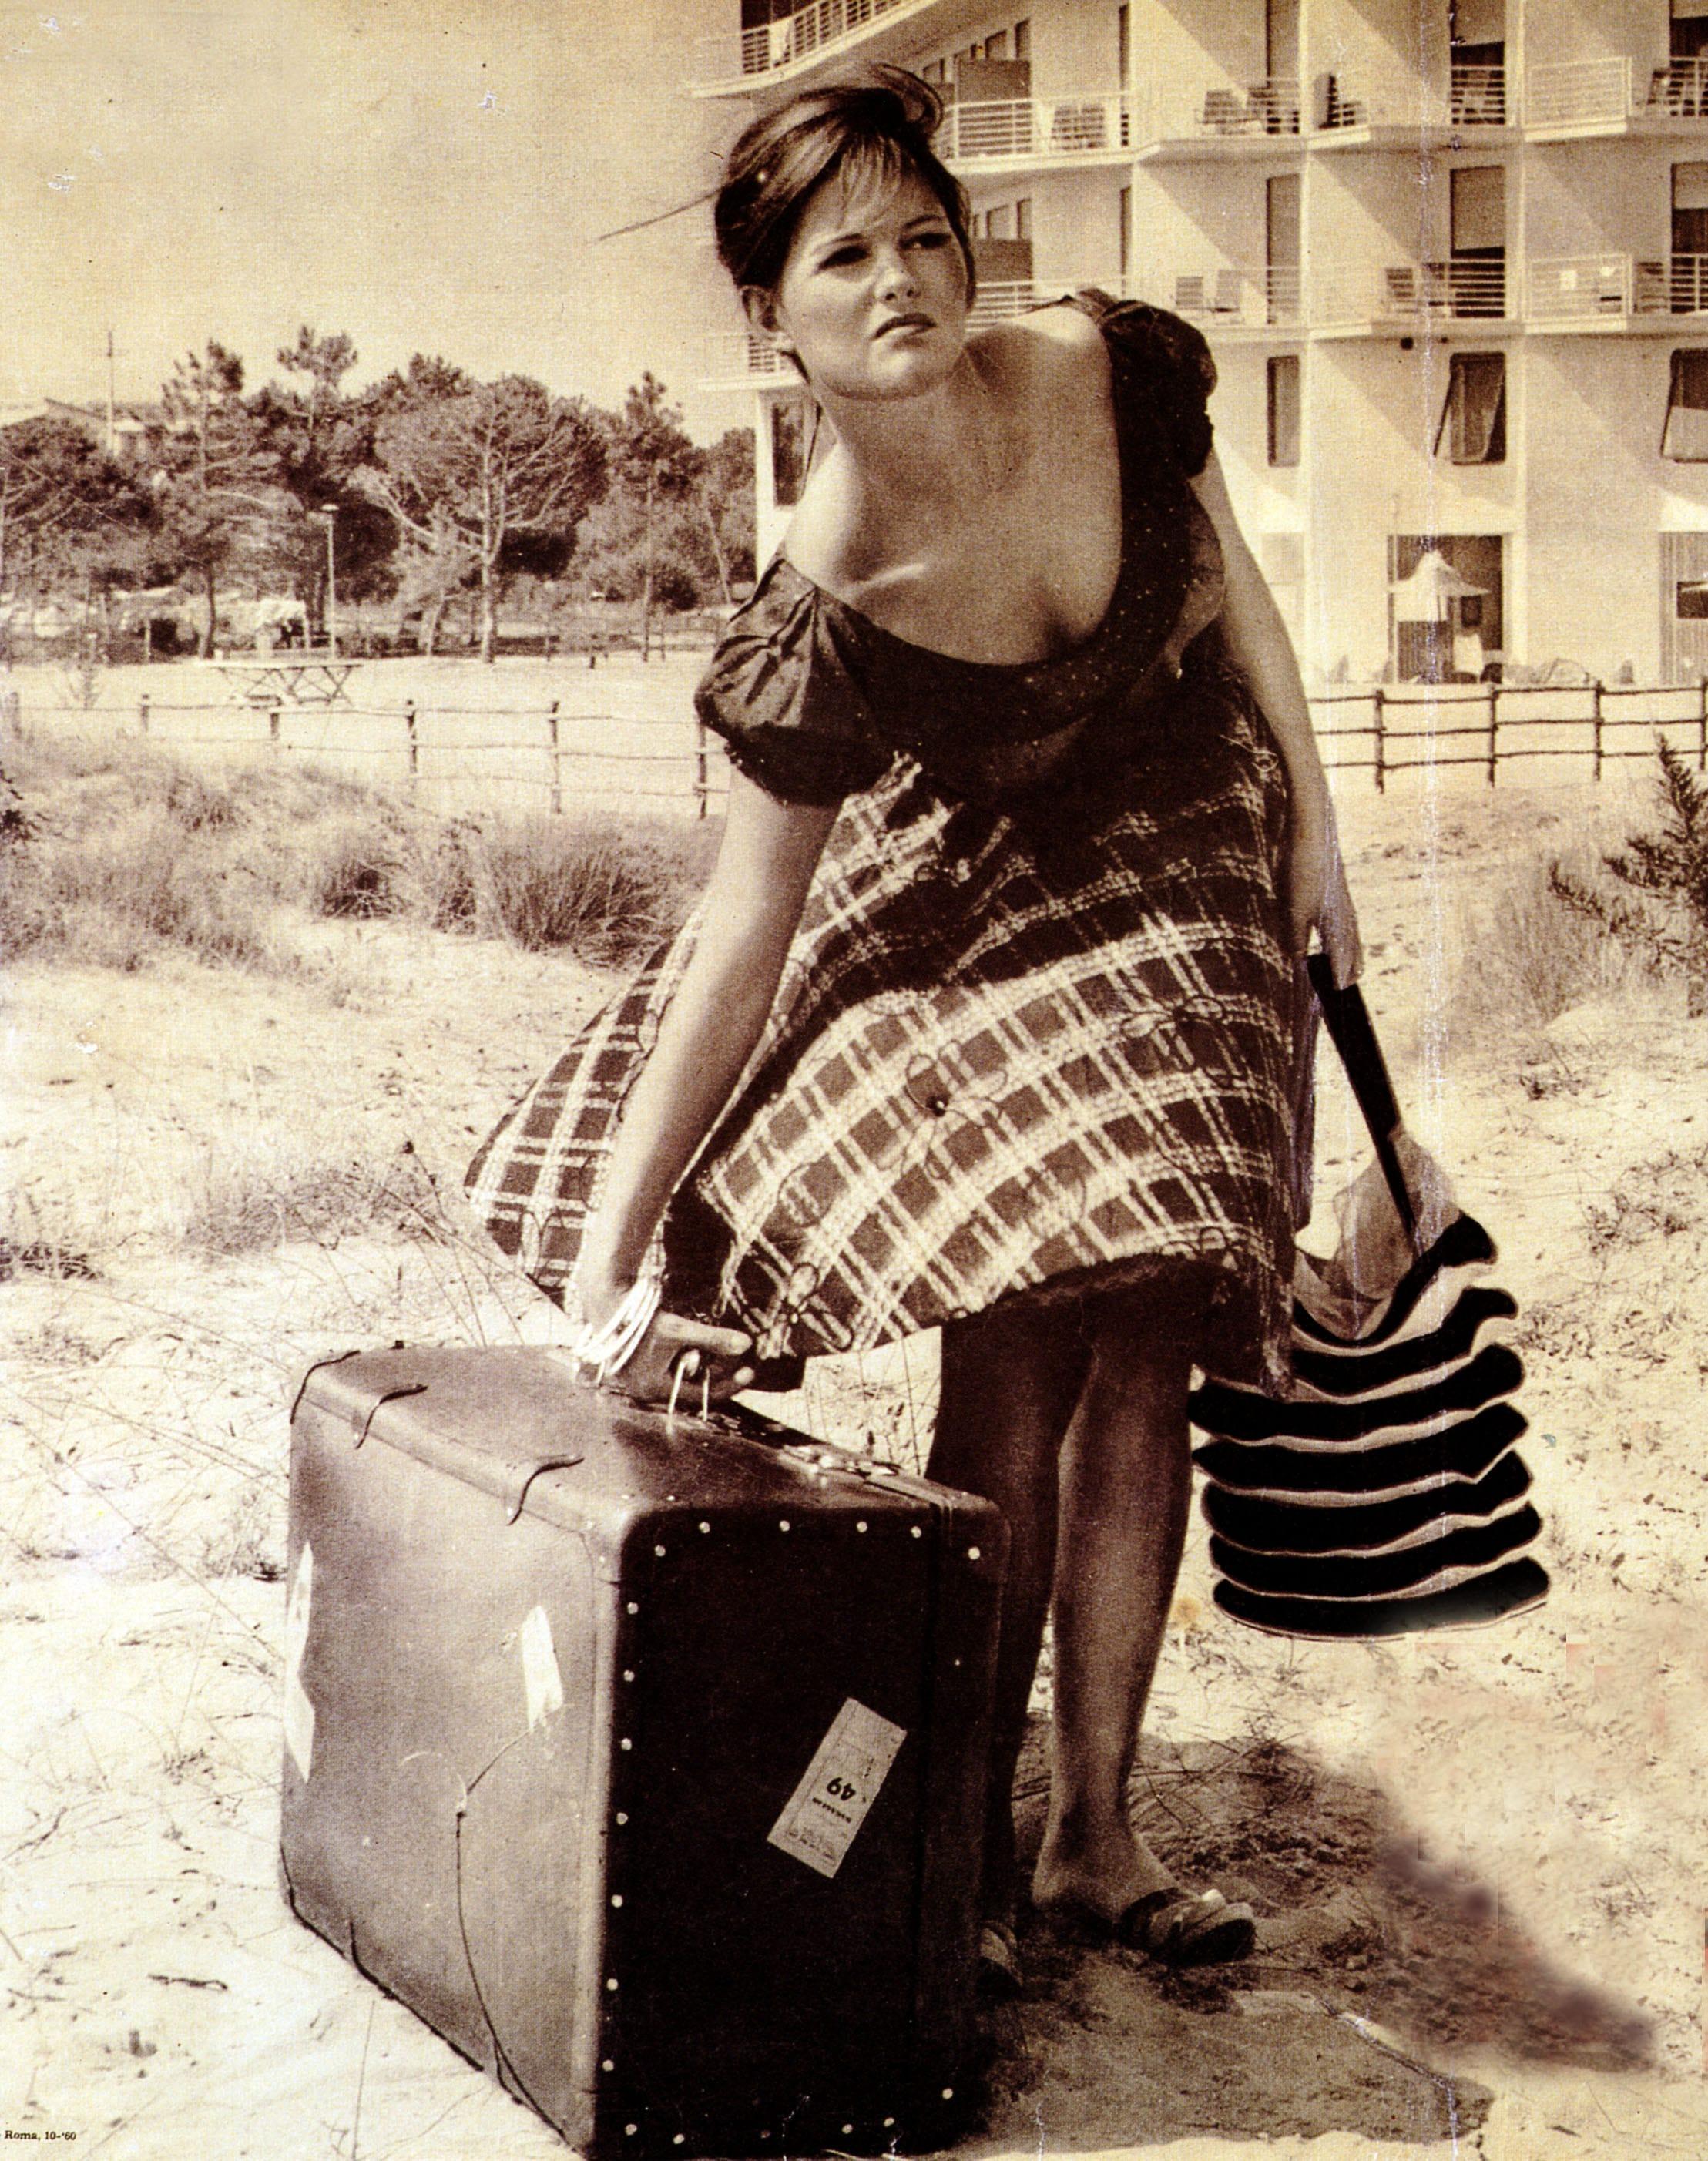 Claudia Cardinale Backgrounds